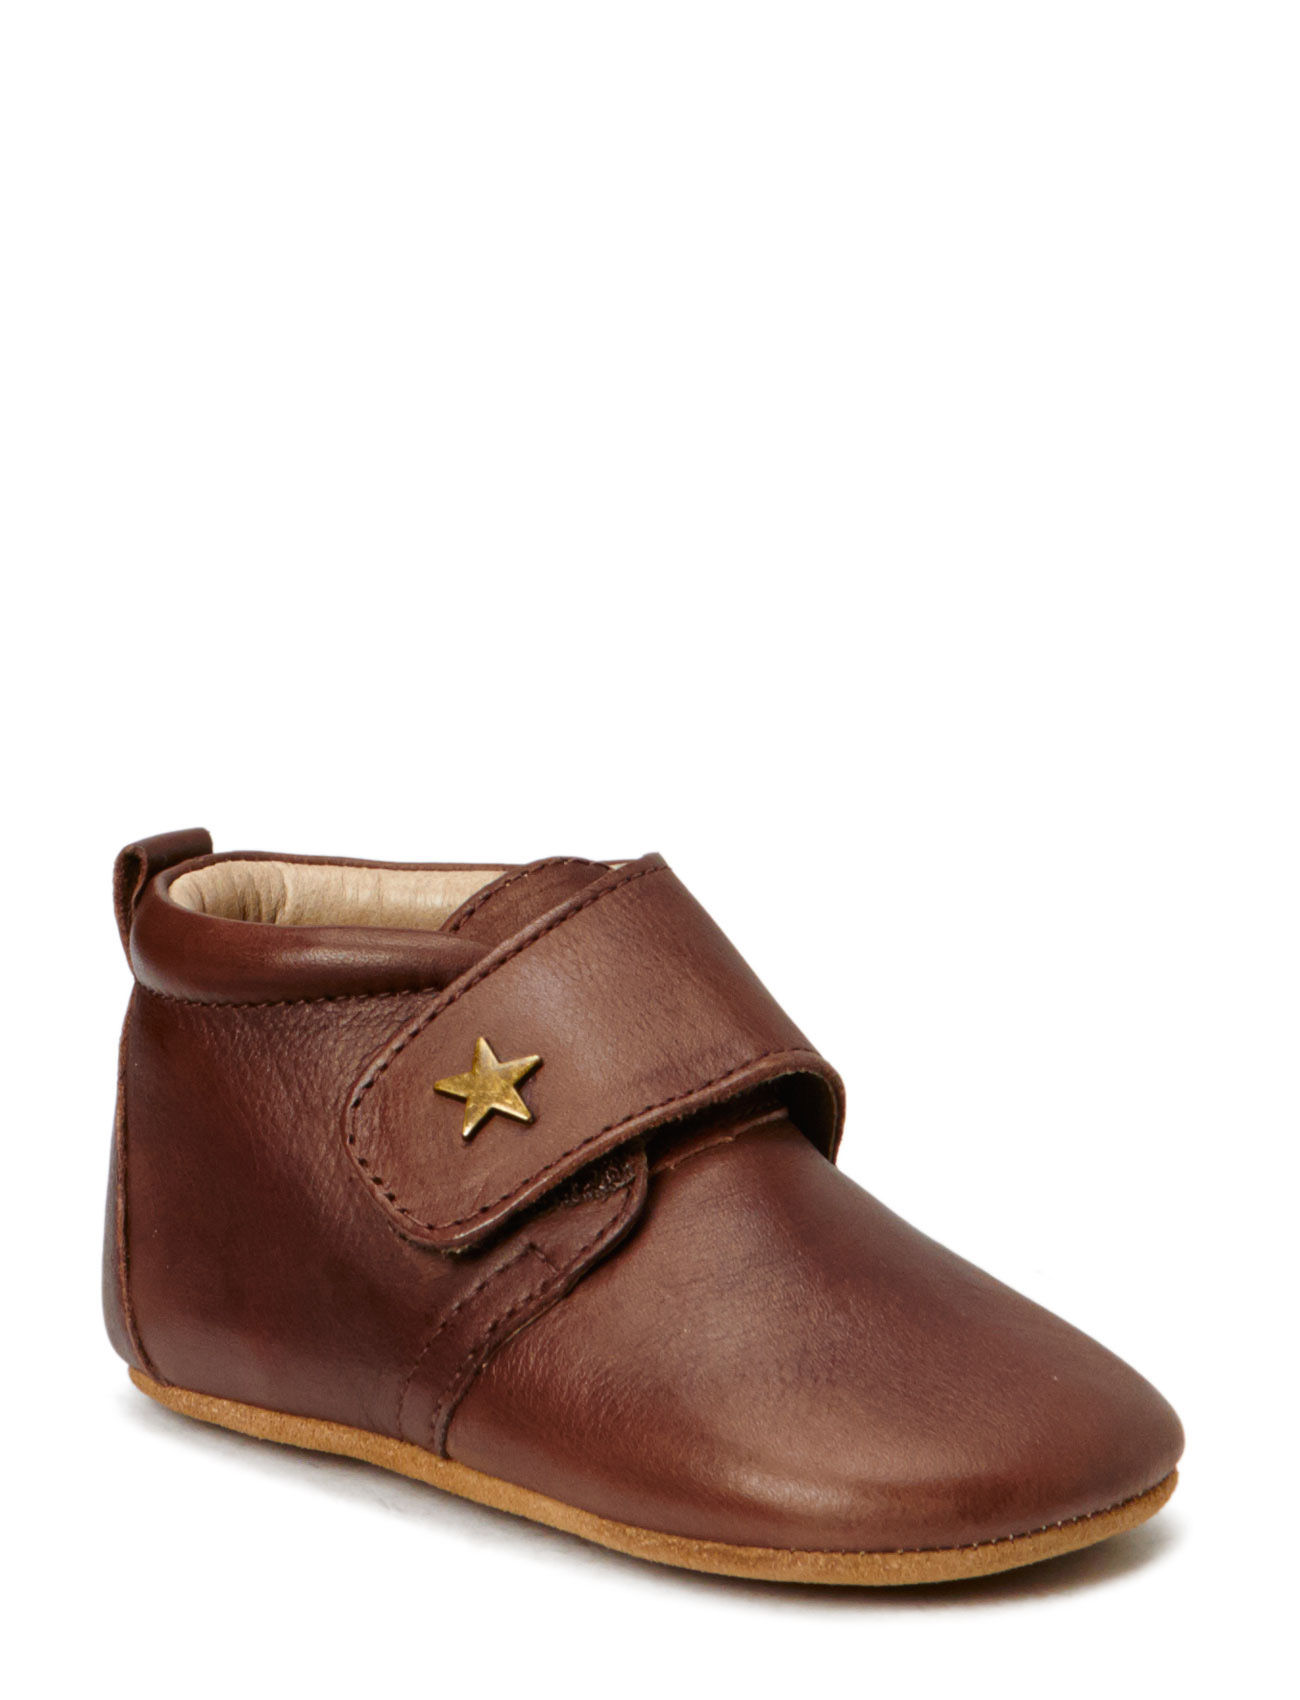 d443f75b4b93 Hjemmesko - Velcro Stjerne (60 Brown) (44.95 €) - Bisgaard -